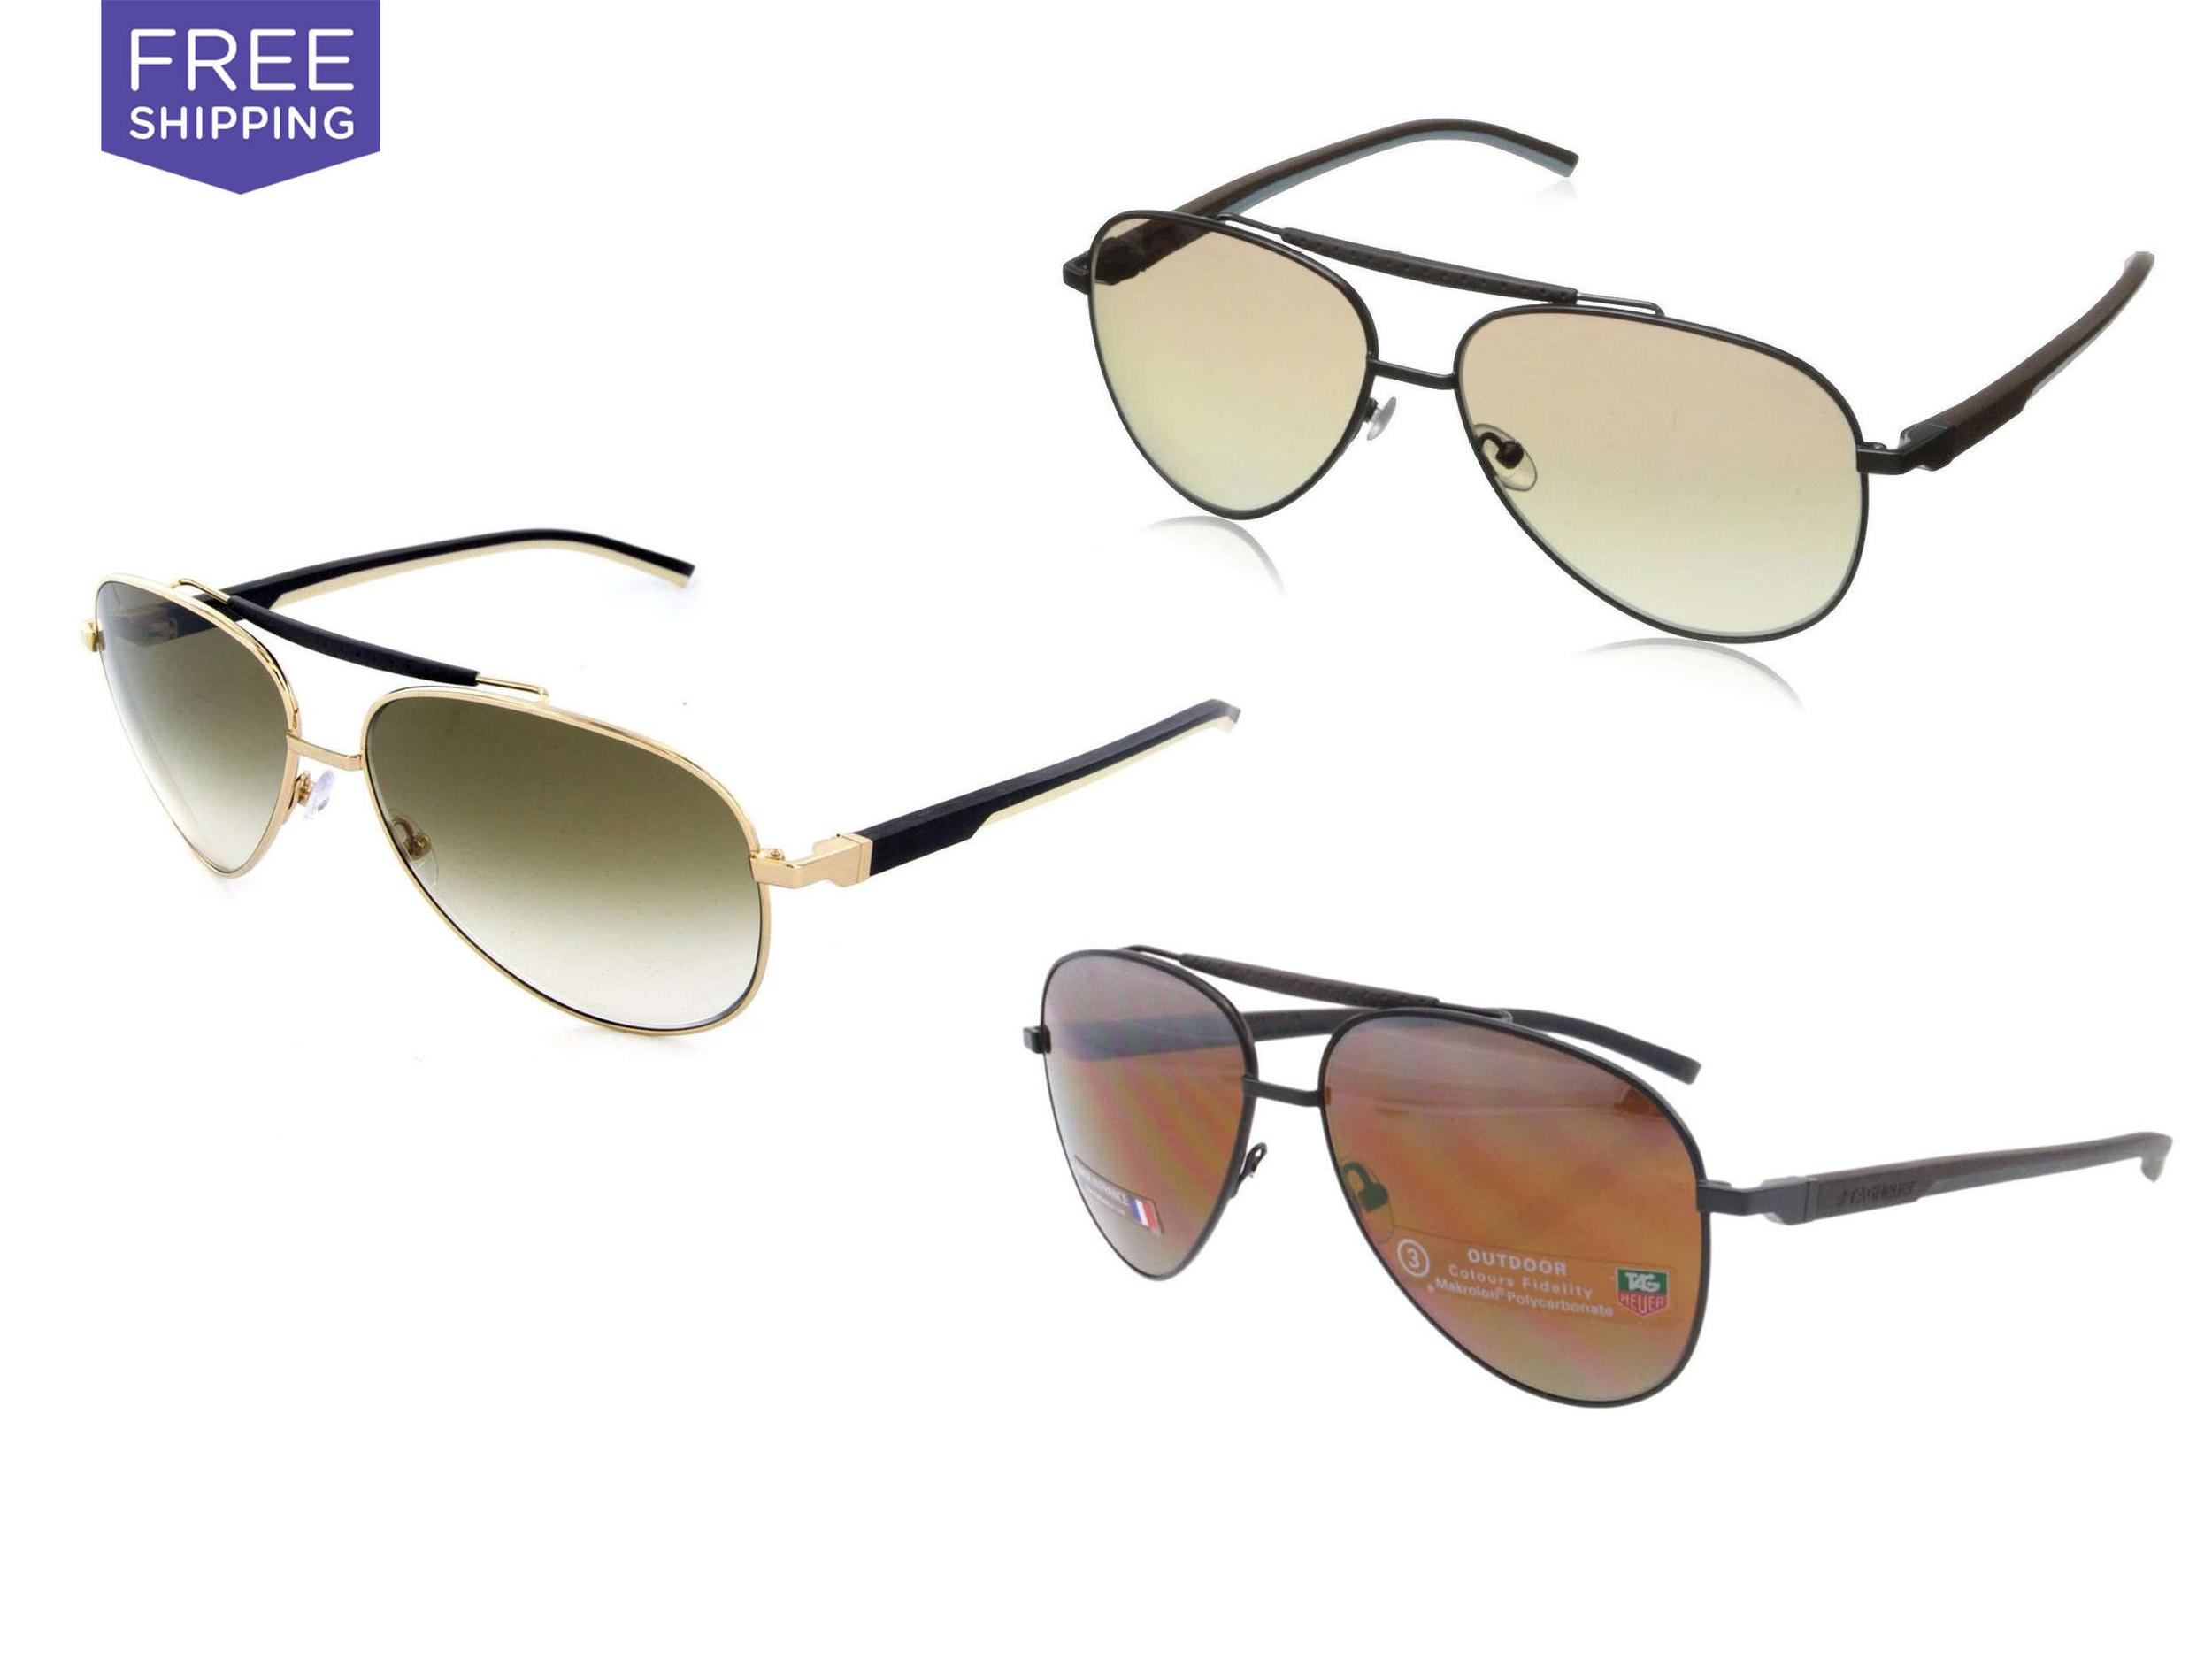 Tag Heuer Tag Heuer Men's Aviator Sunglasses, $179.99    Deal Run Date Ends: 10/6/15